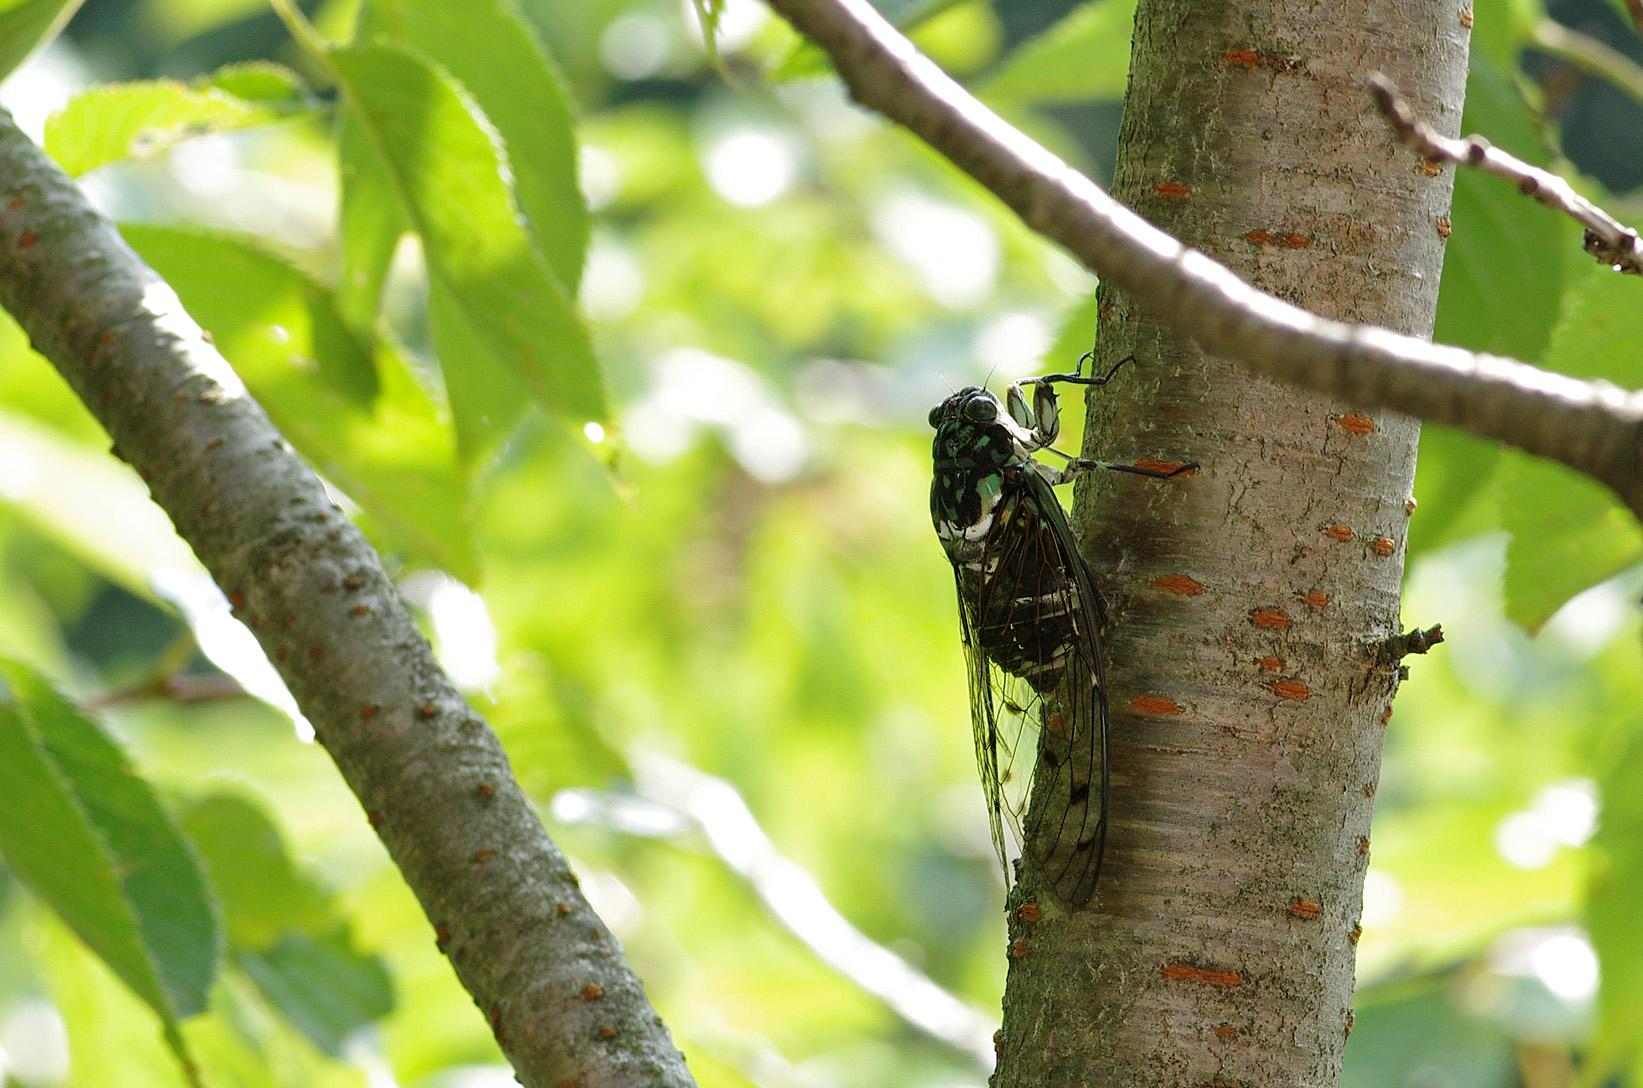 Cigale Minminzemi, Hyalessa maculaticollis, mâle à Yunoyama au Japon en août 2013). Chant de l'espèce : miiine-mine-mine-mine...